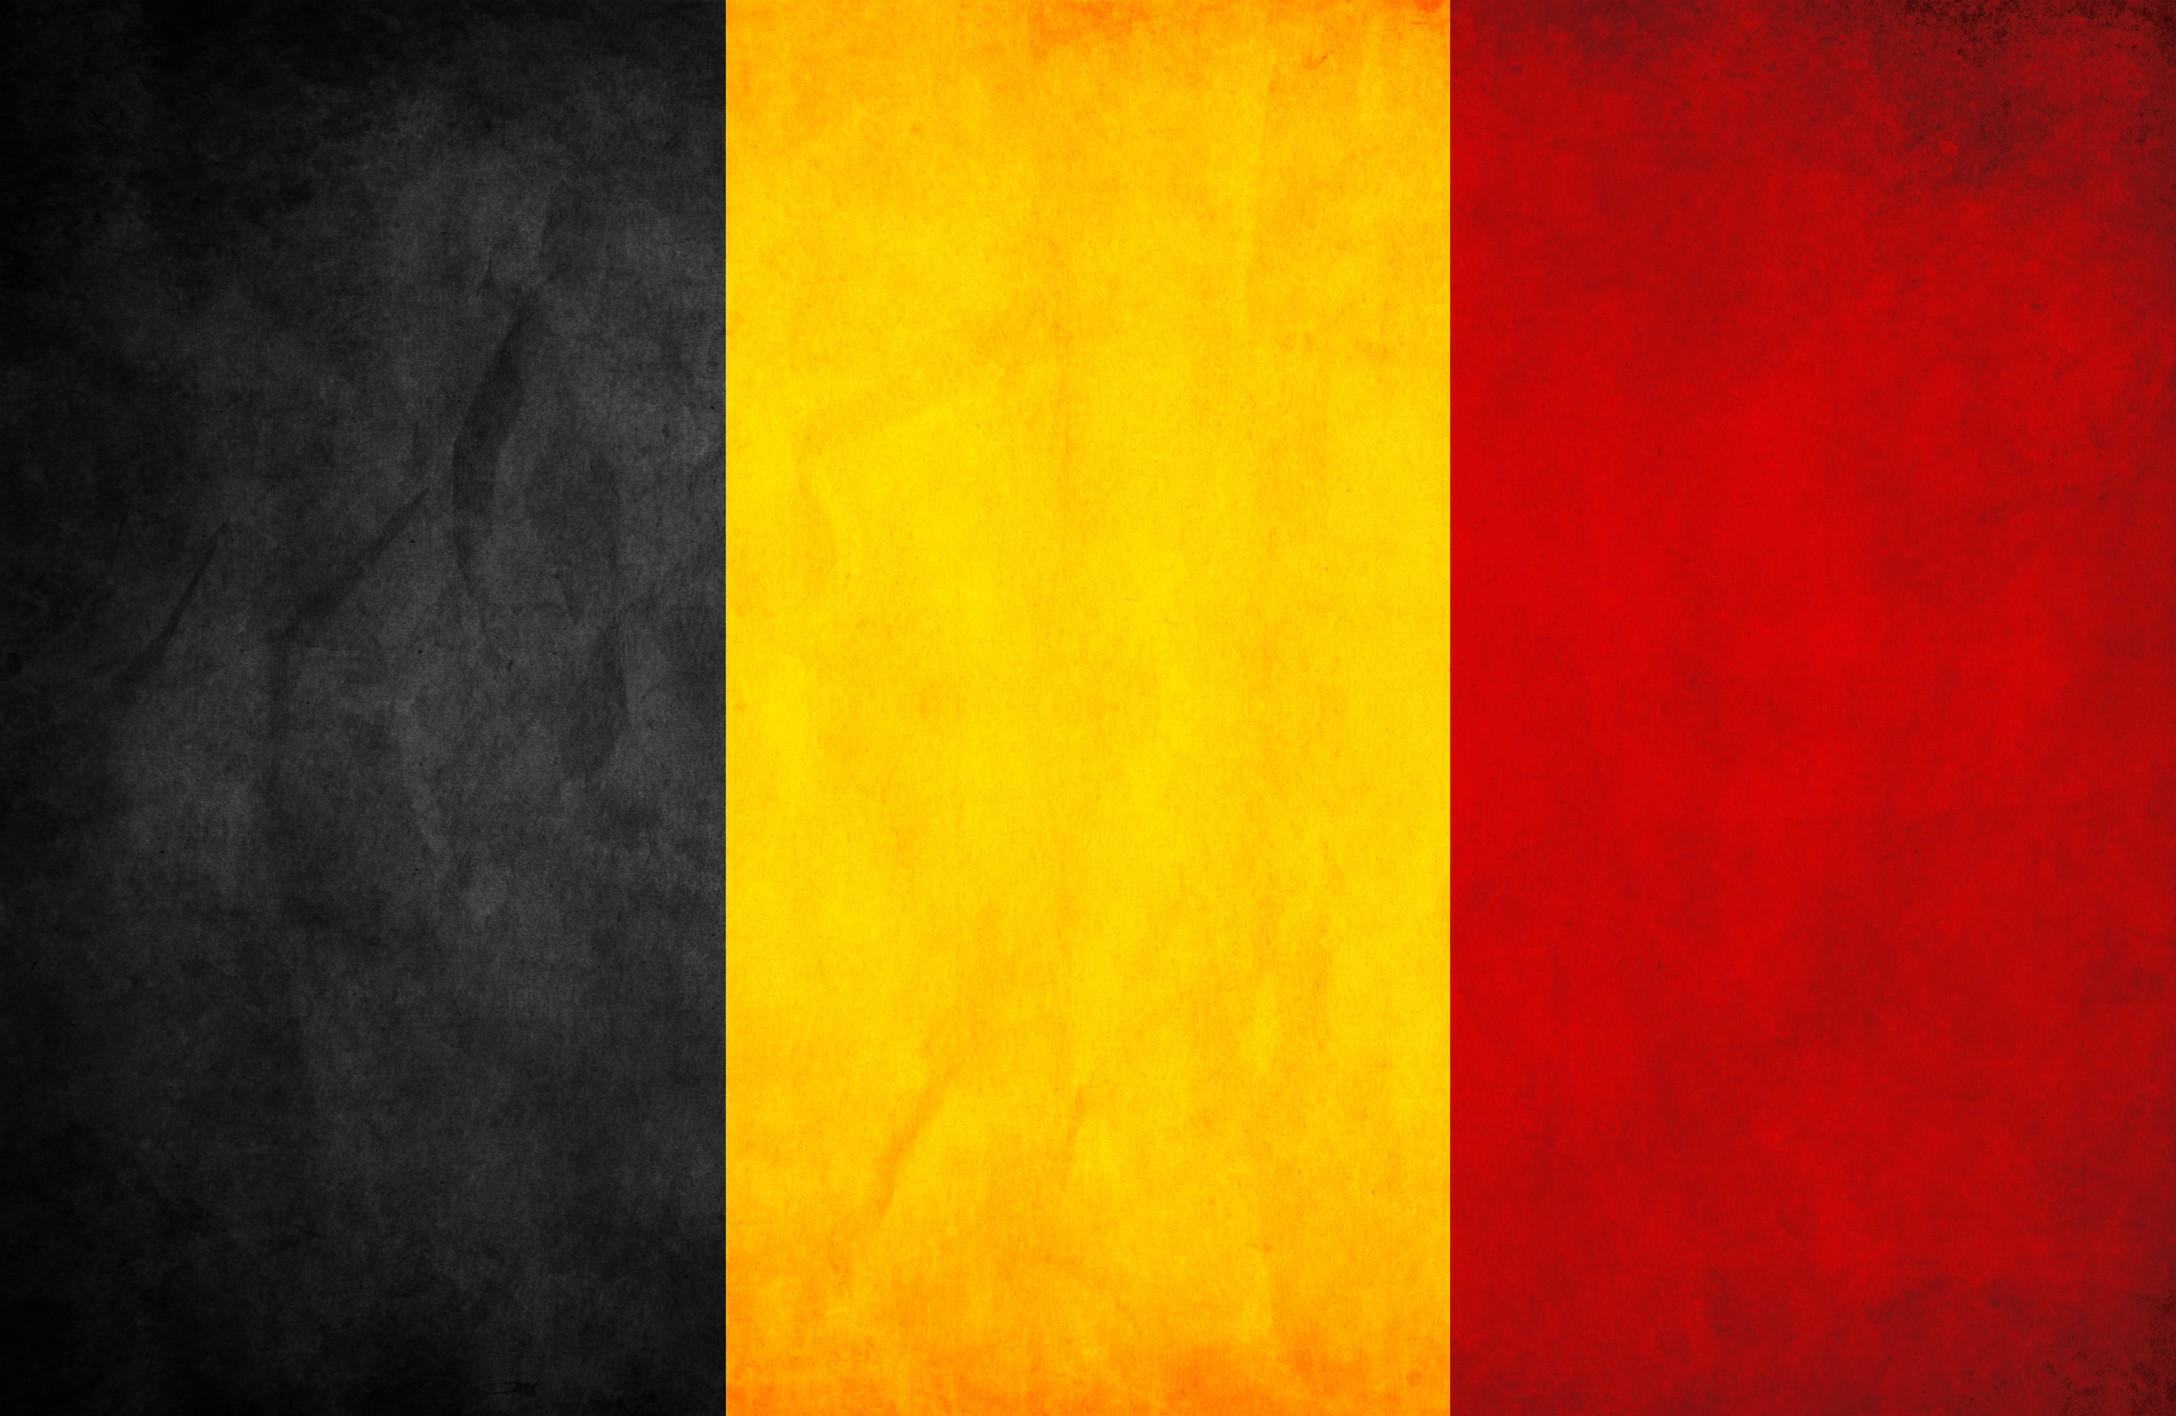 Wallpaper : black, red, yellow, flag, texture, circle, Belgium ...